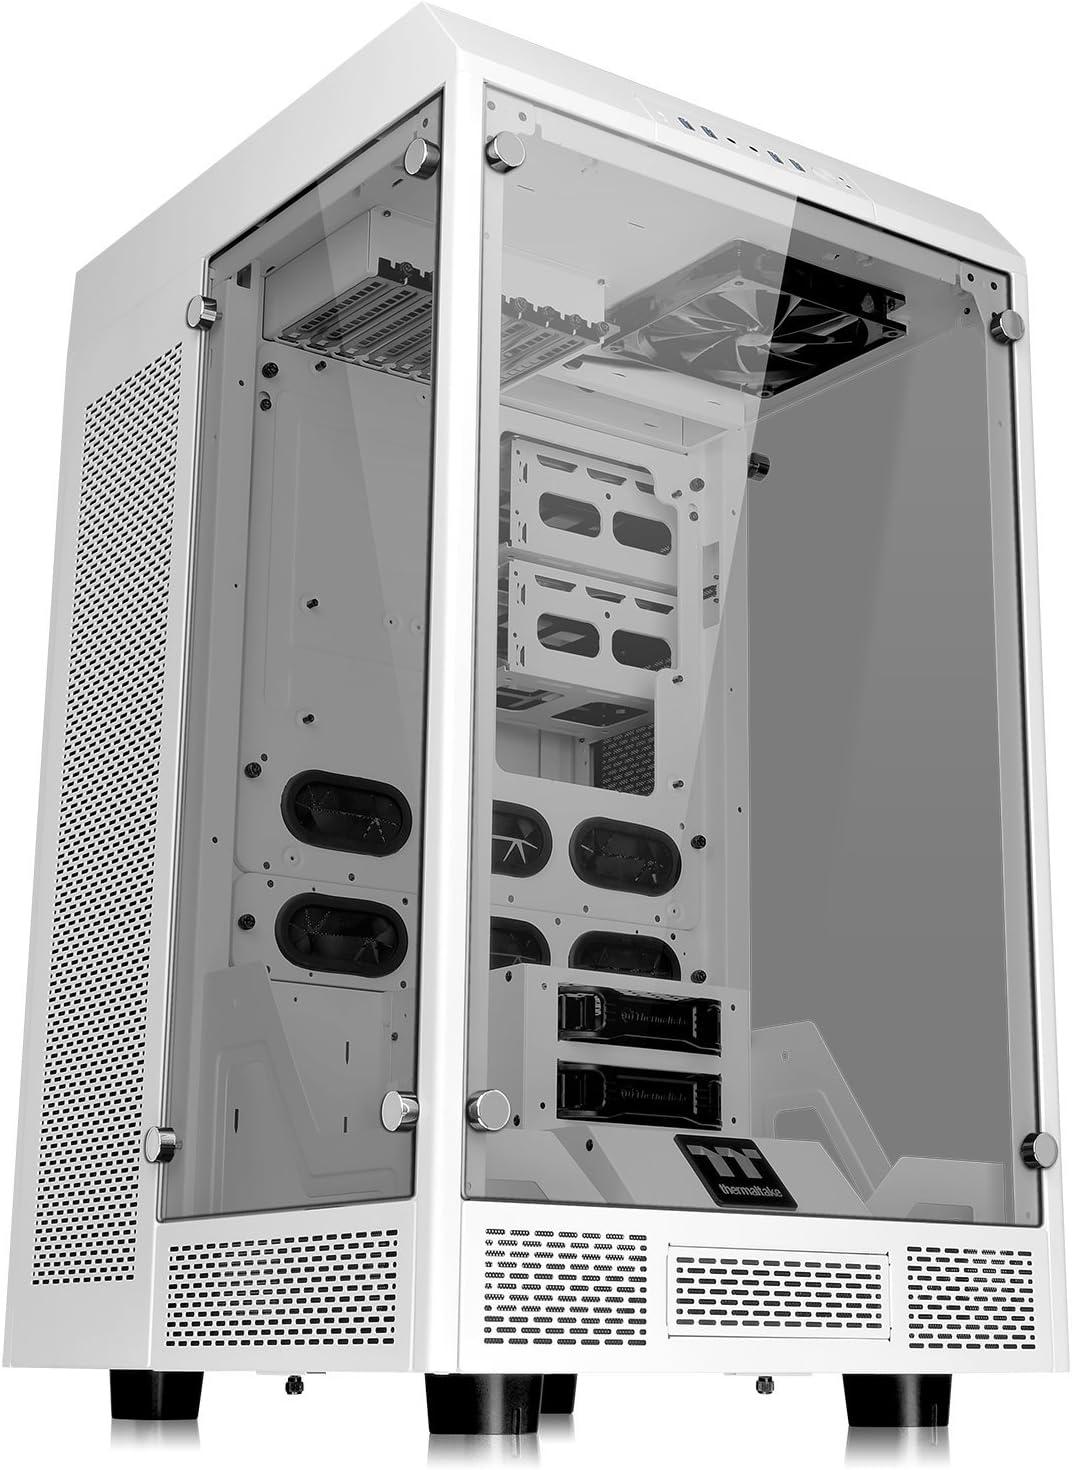 Thermaltake The Tower 900 Snow Edition Full-Tower Blanc - Unités centrales (Full-Tower, PC, SGCC, Verre trempé, Blanc, ATX,EATX,Micro ATX,Mini-ITX, Maison/Bureau)